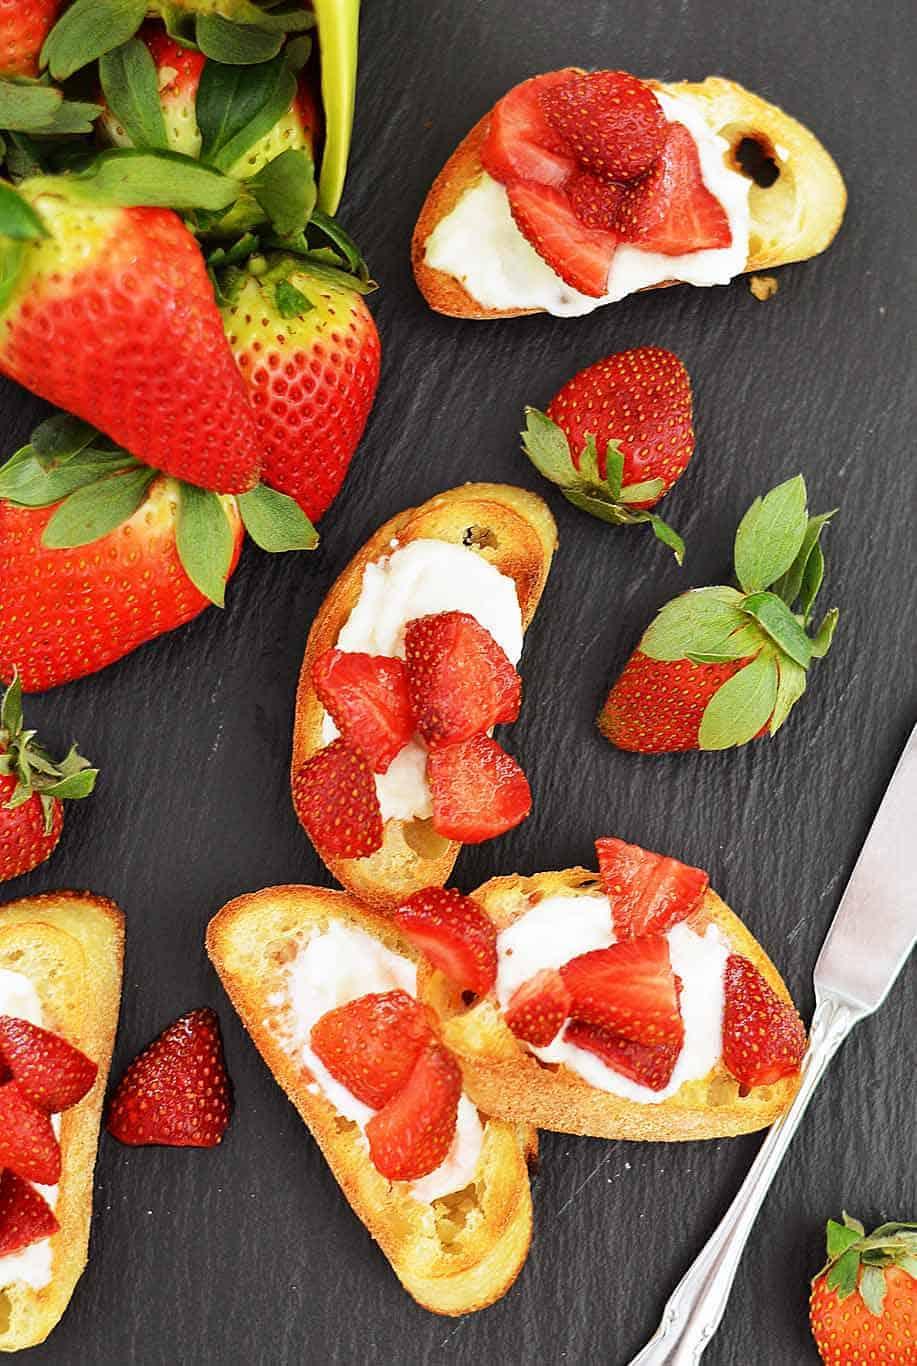 Strawberry Crostini with Whipped Vegan Ricotta